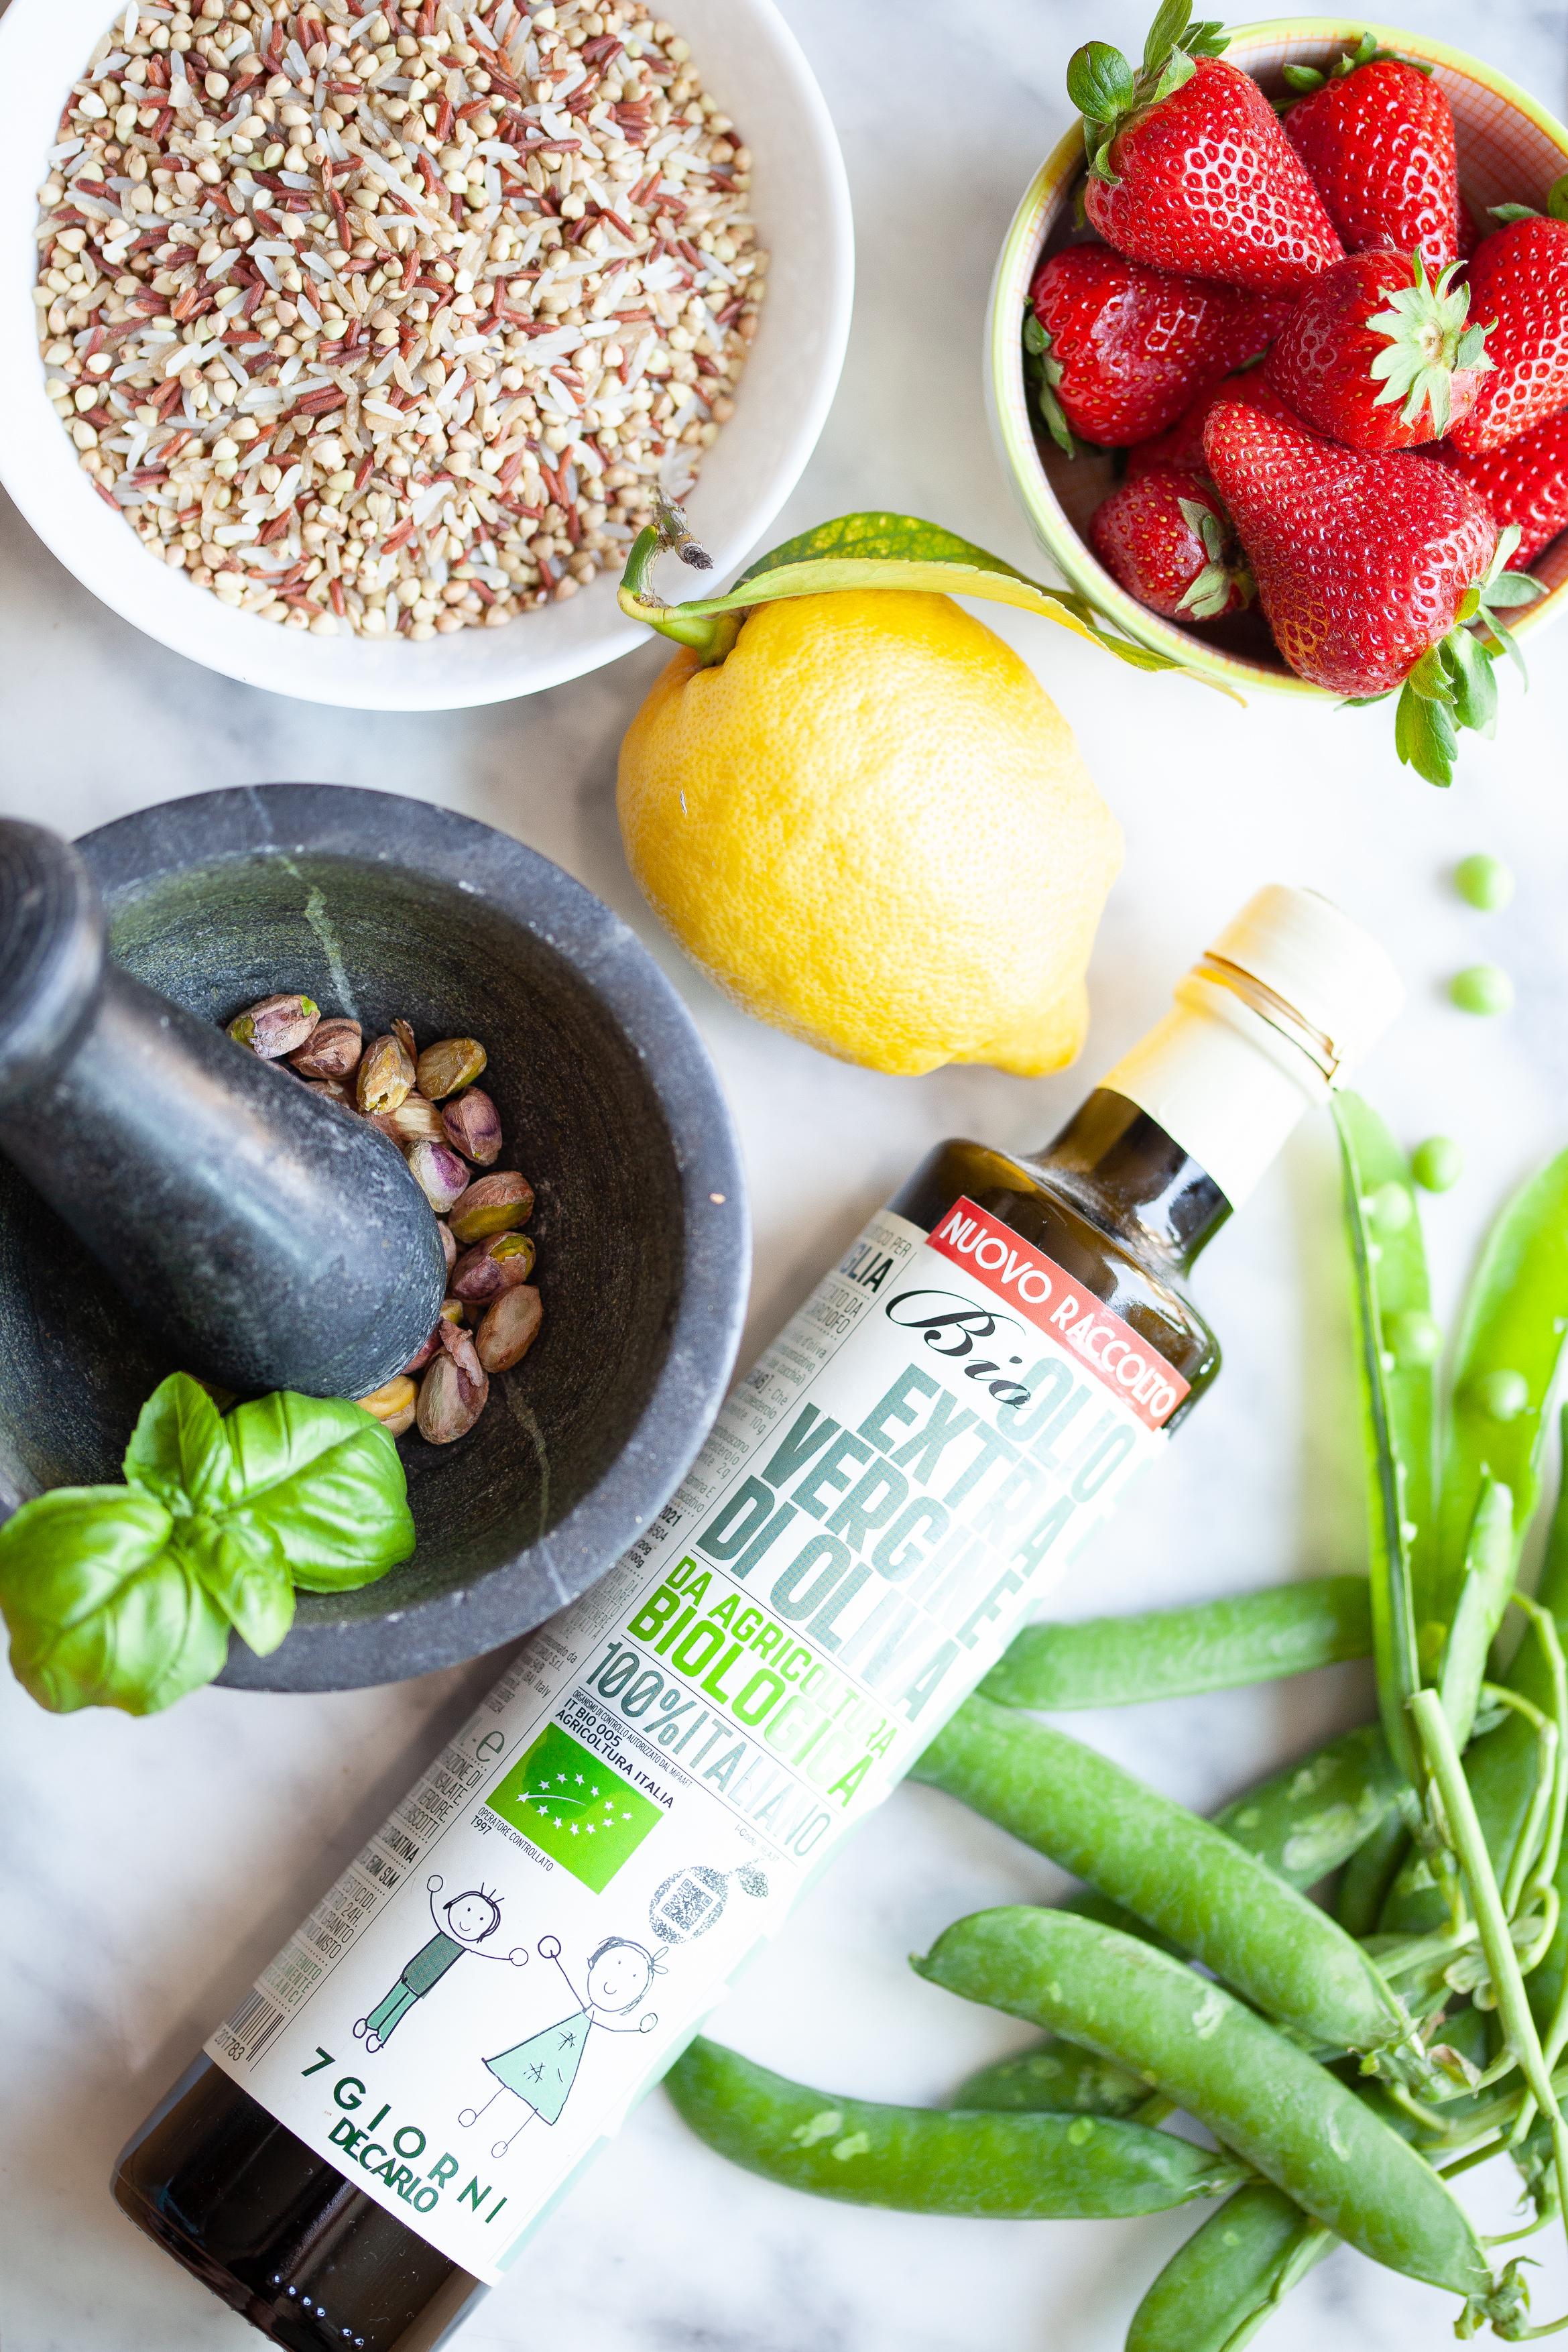 ingredienti insalata oliodecarlo Alessia Aloe